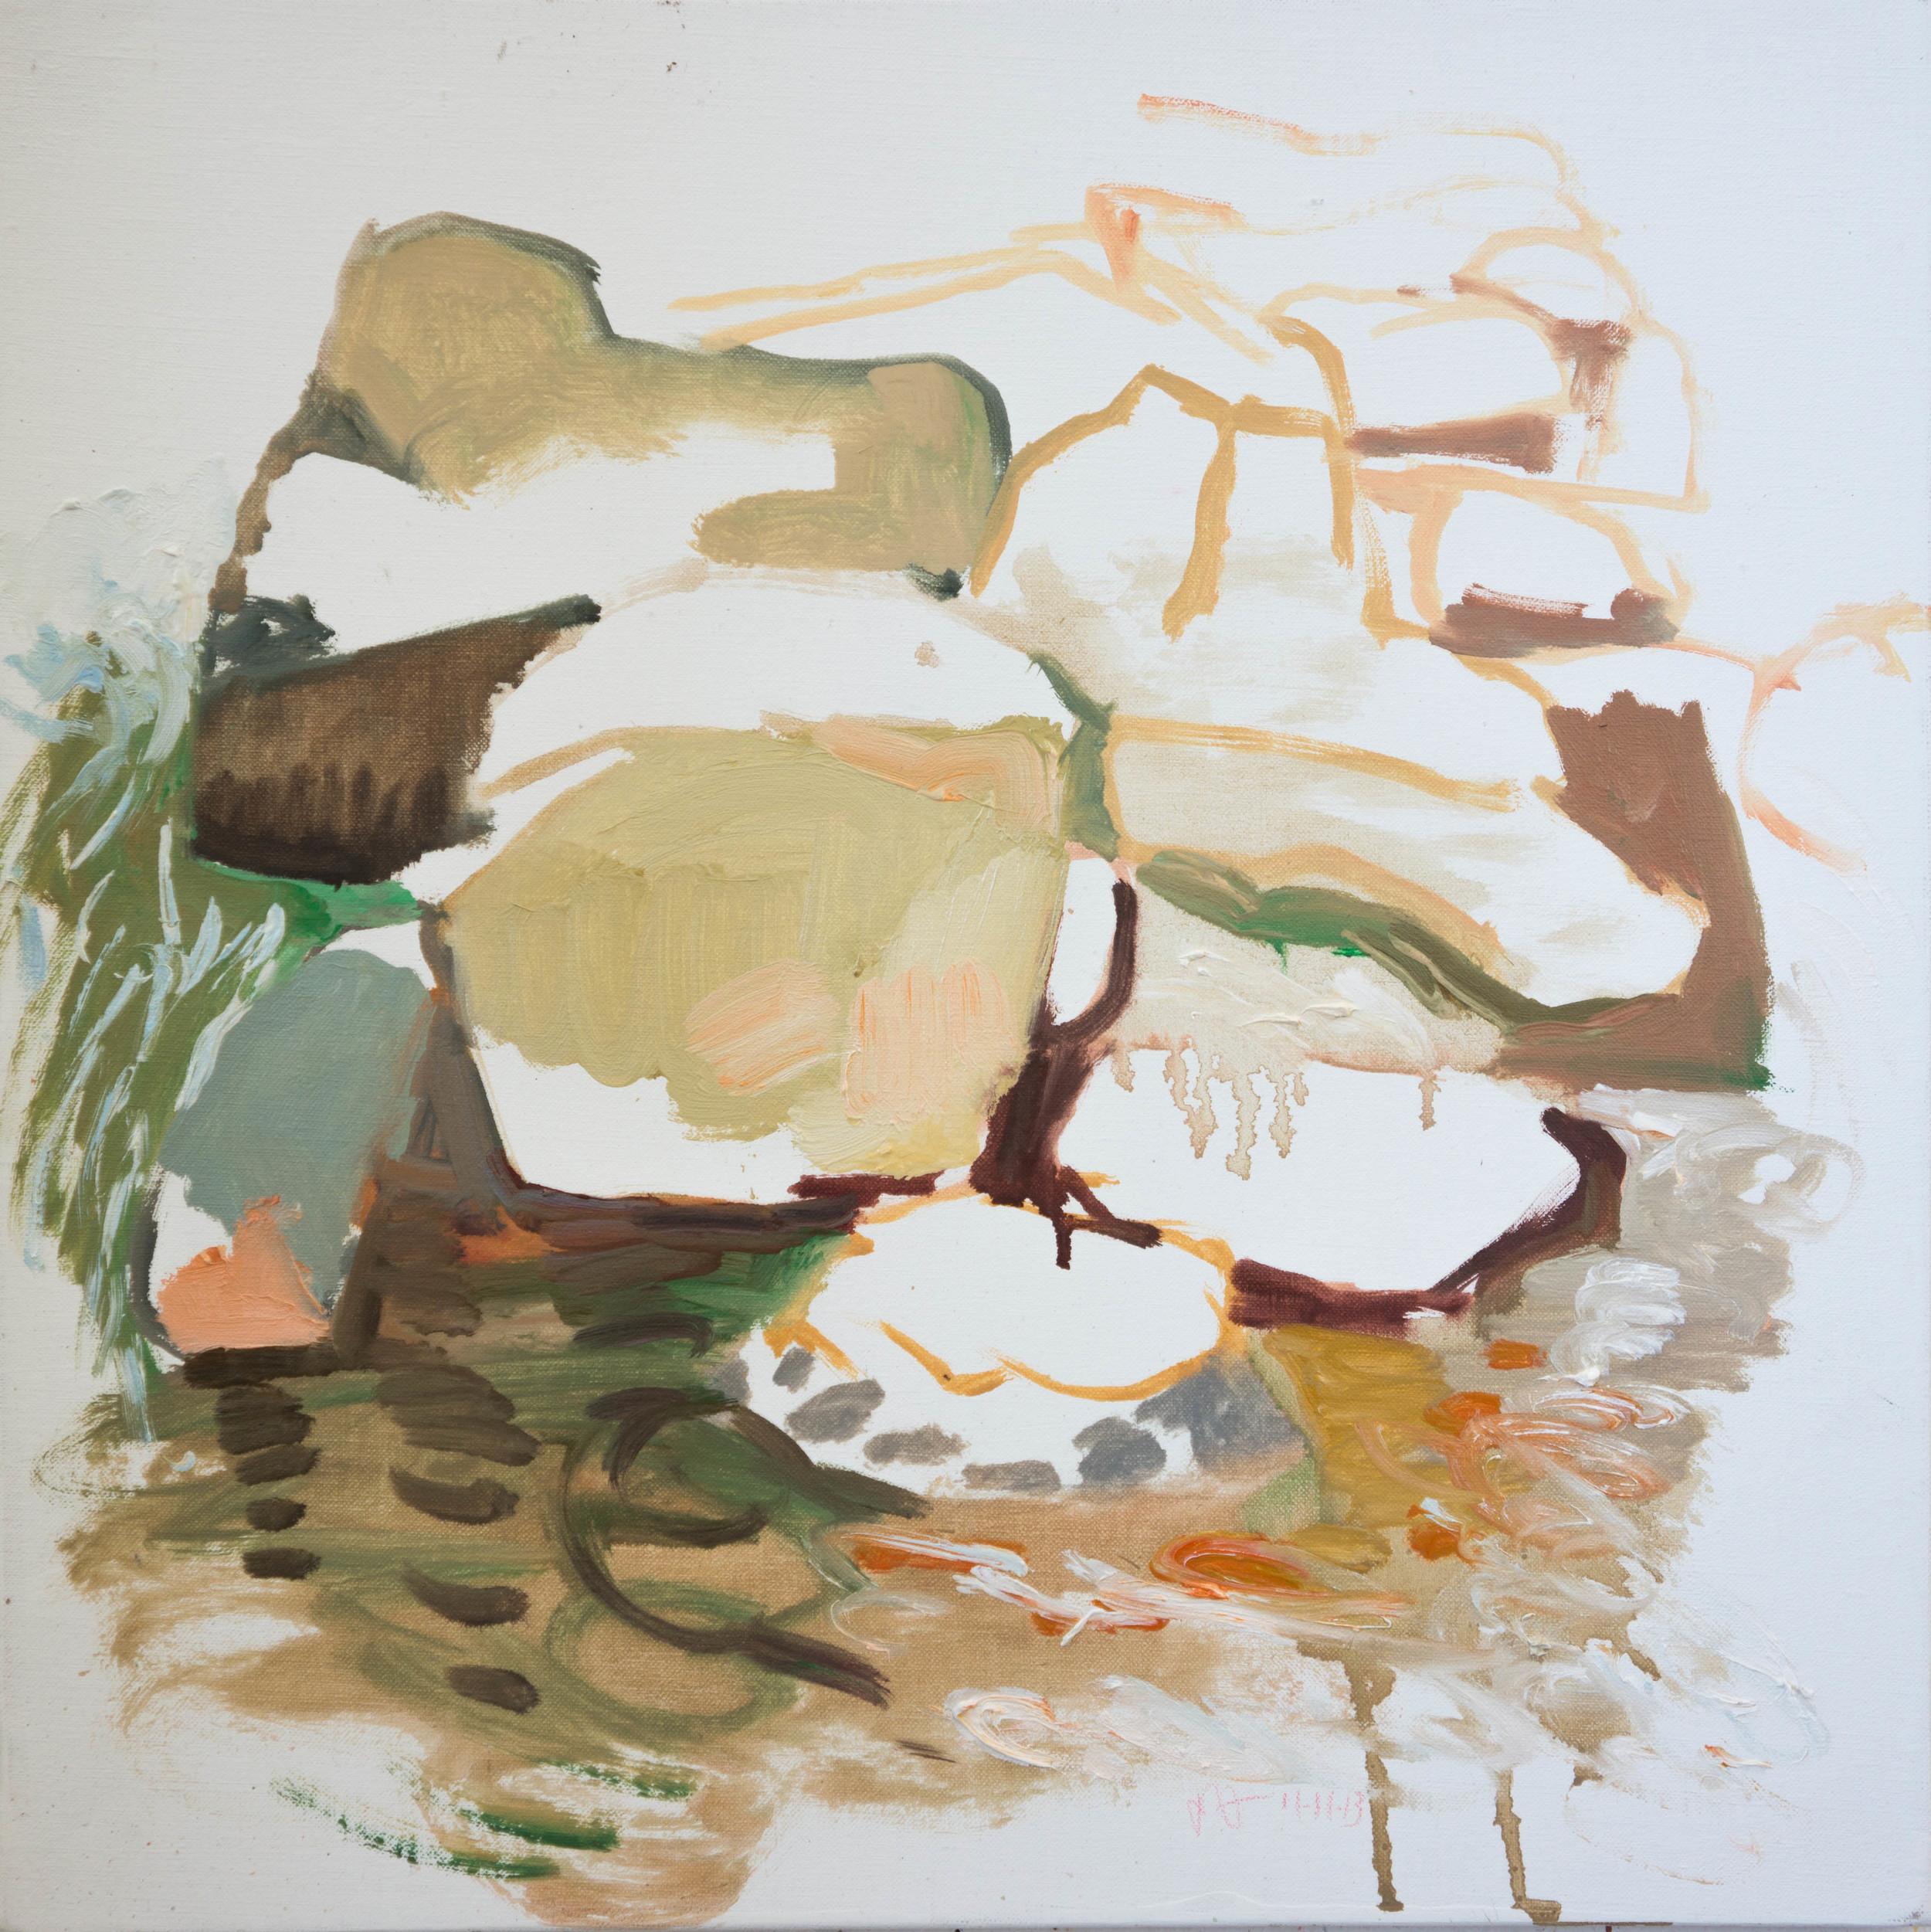 "11/11/13 n. crestone creek  16x16""  this plein air painting served as inspiration for  ciyu creek"